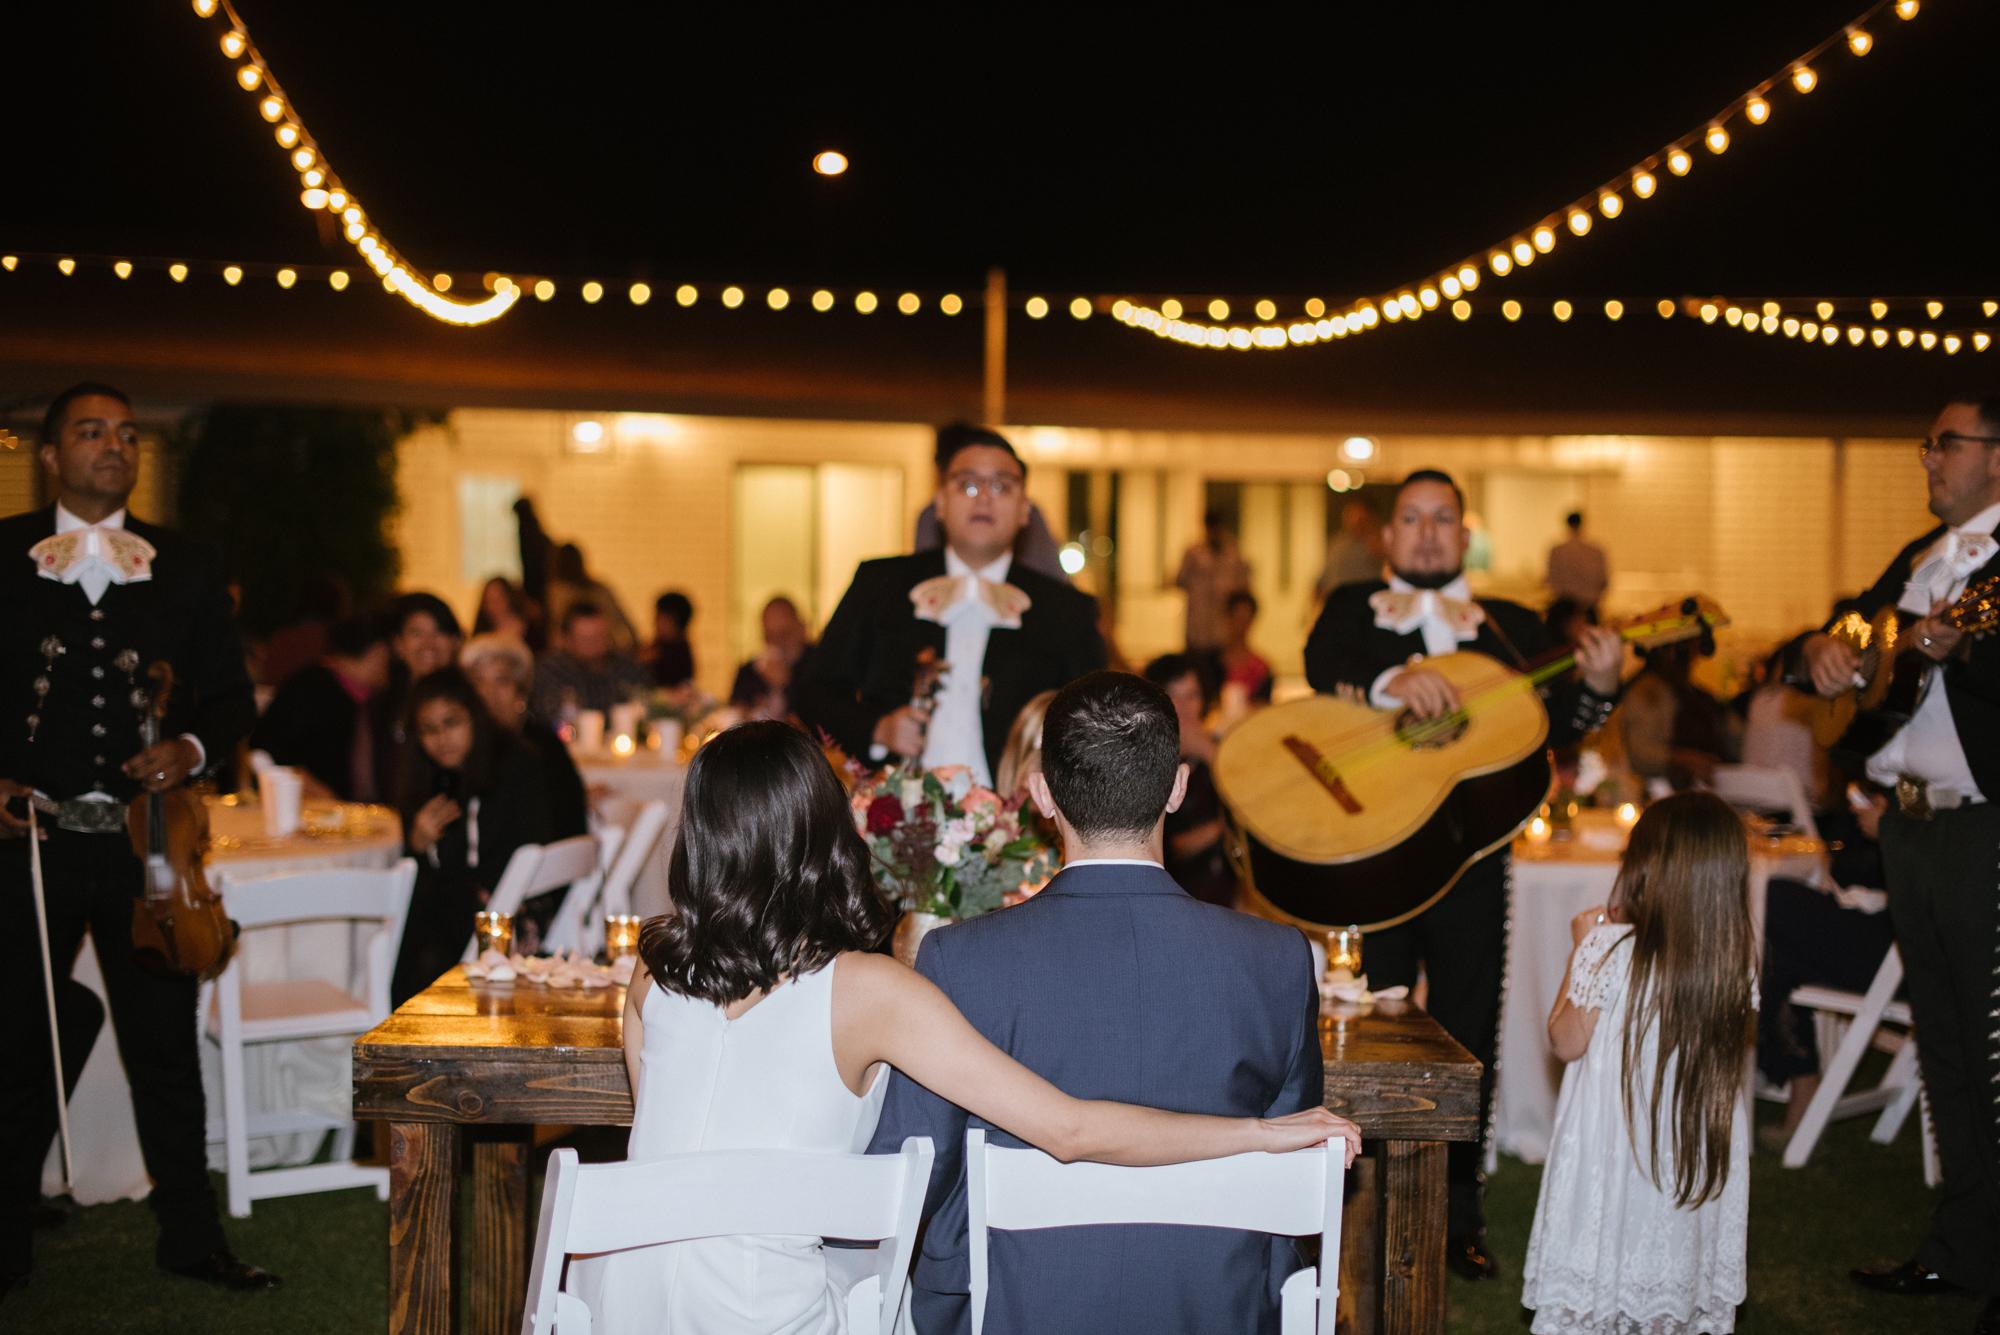 TheGatherEstate-outdoorwedding.jpg